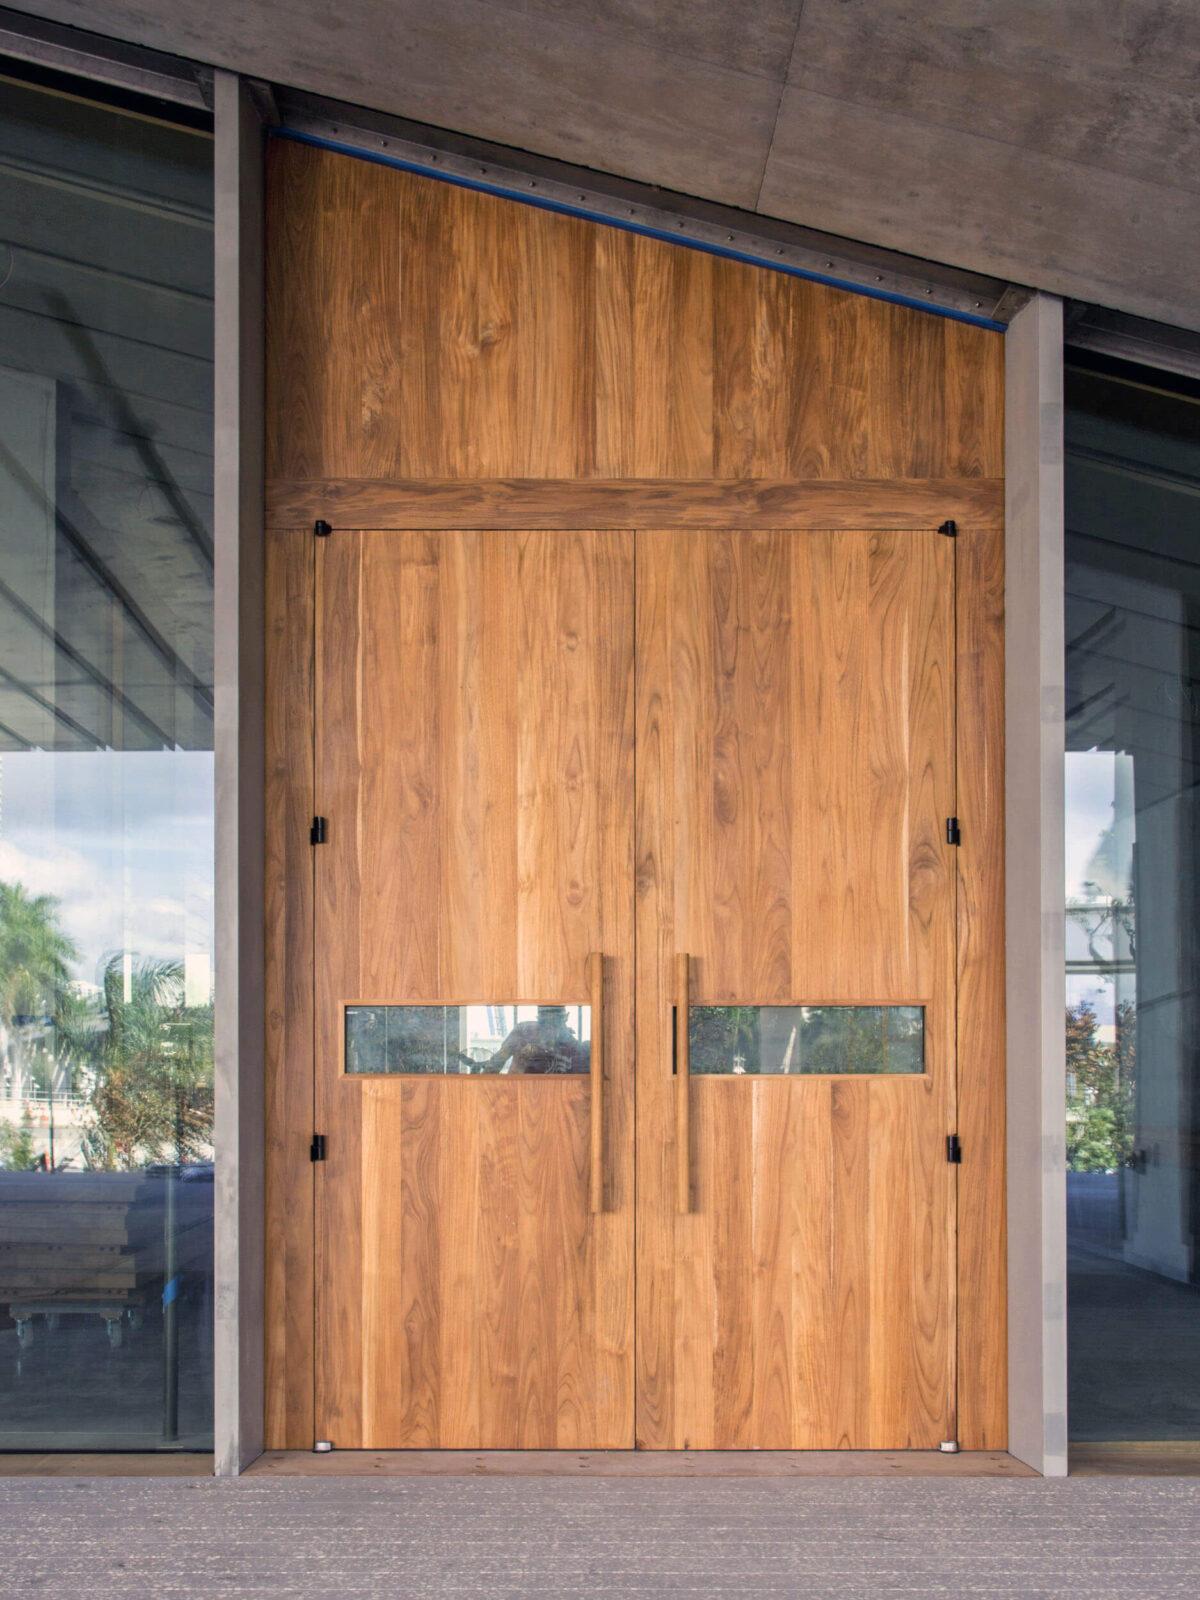 TEAK ENTRANCE DOORS TO RESTAURANT.